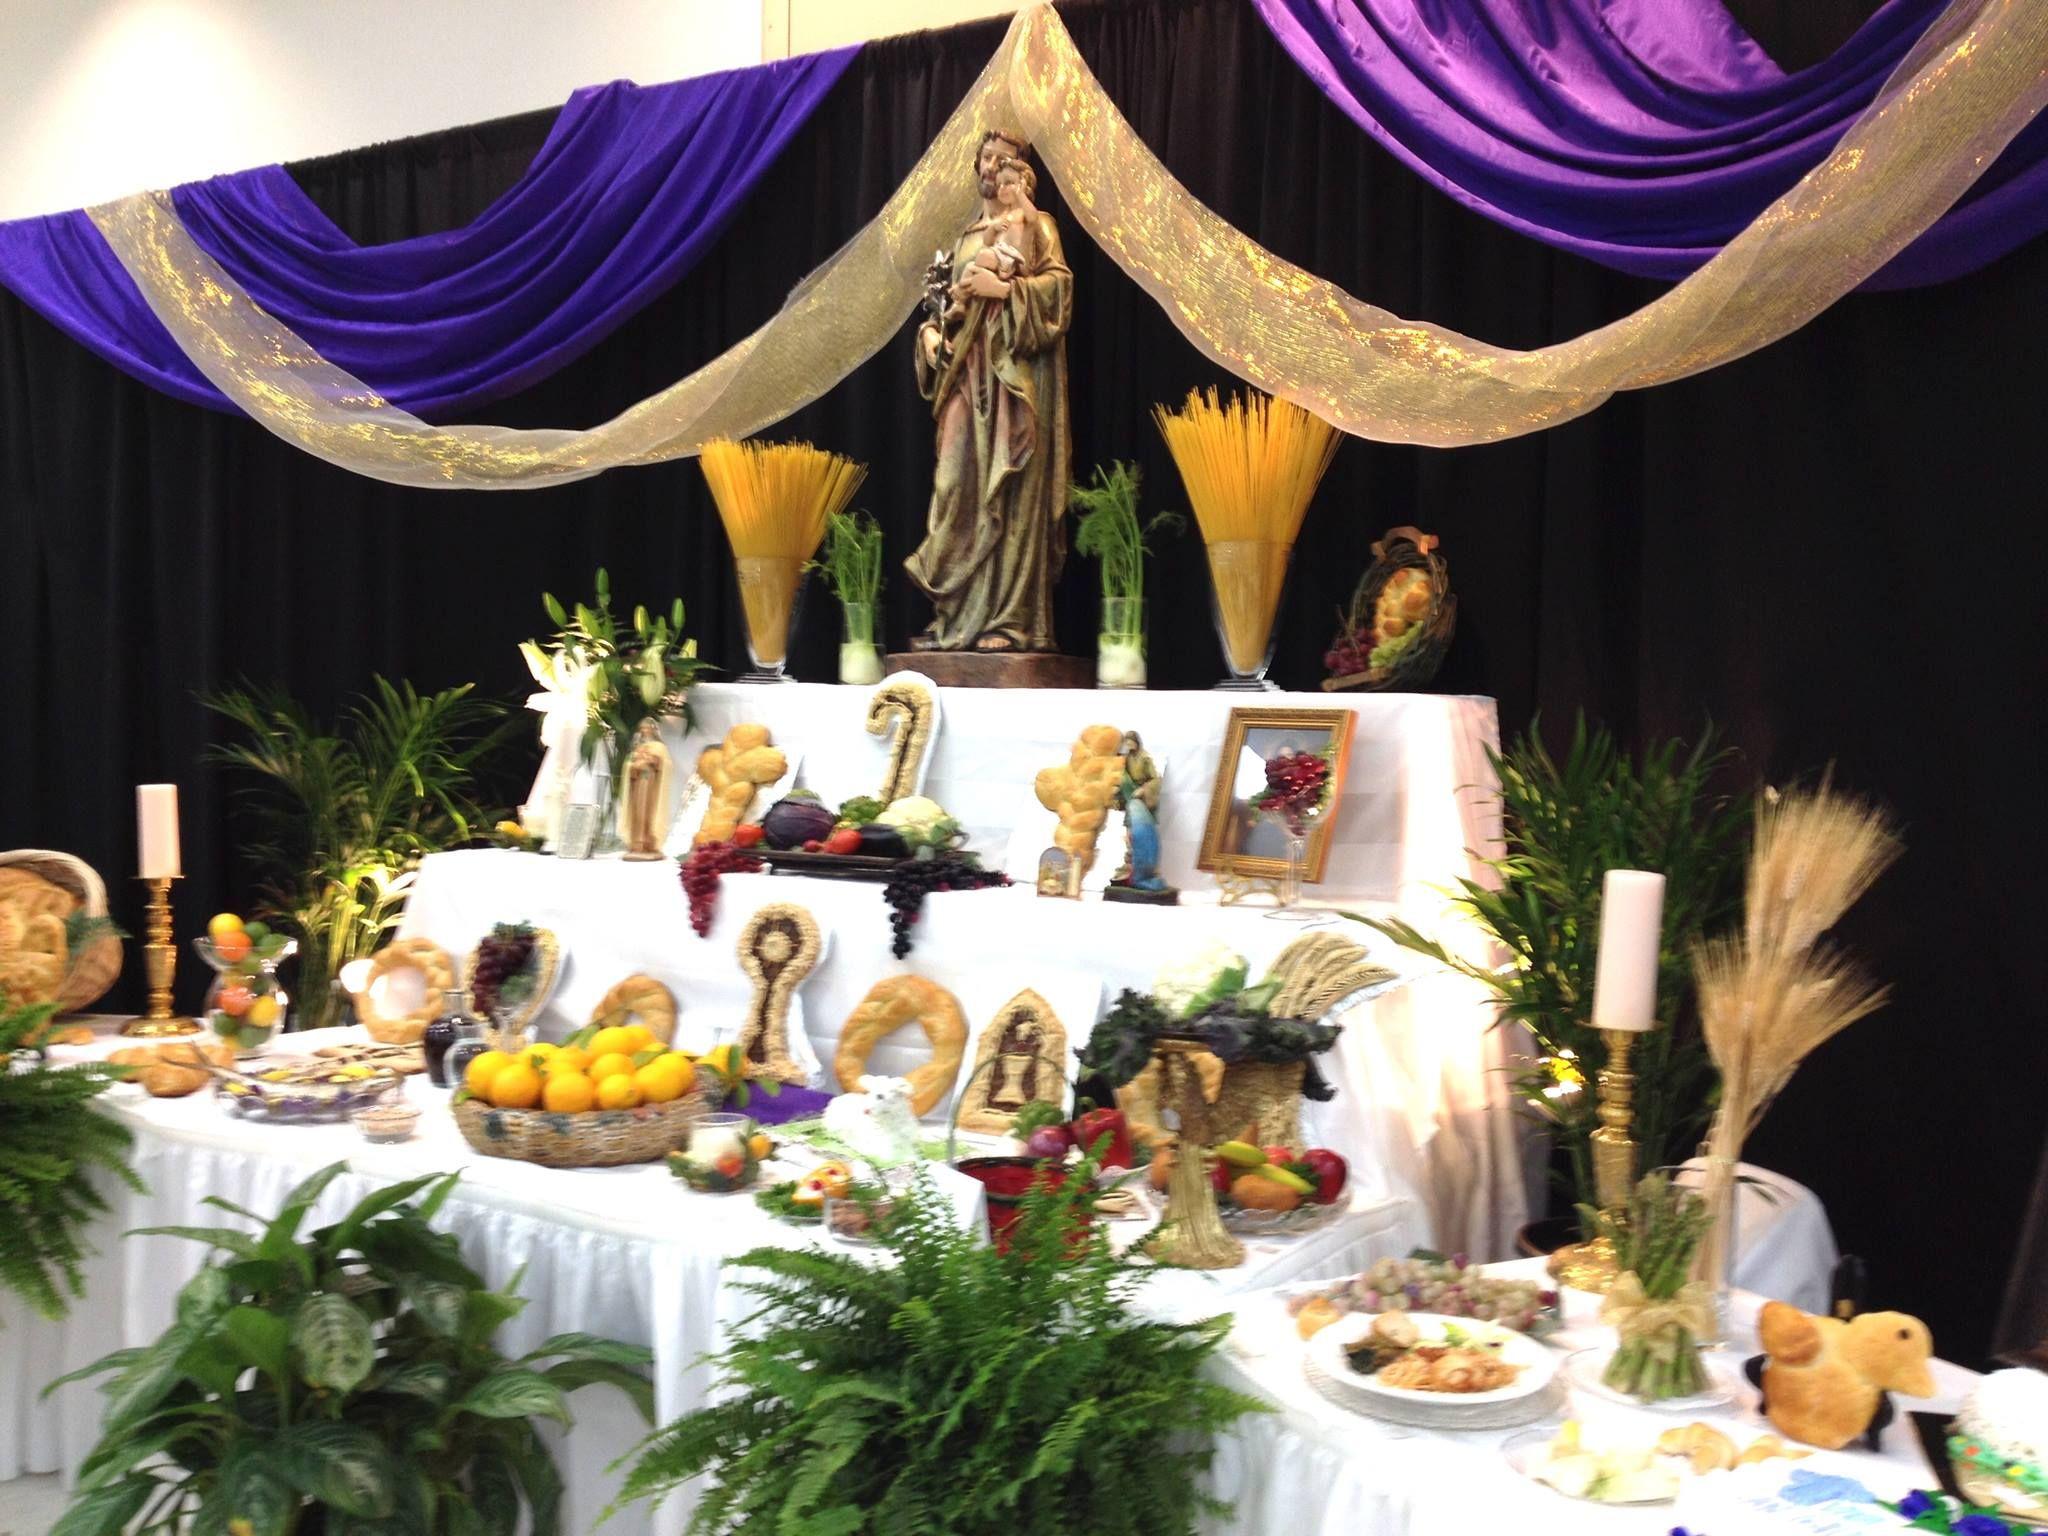 Saint Elizabeth Ann Seton Catholic Church, Houston Texas 2015 St. Joseph Altar. Our Italian Club offers a free spaghetti dinner for anyone. Thank you Italian Club.